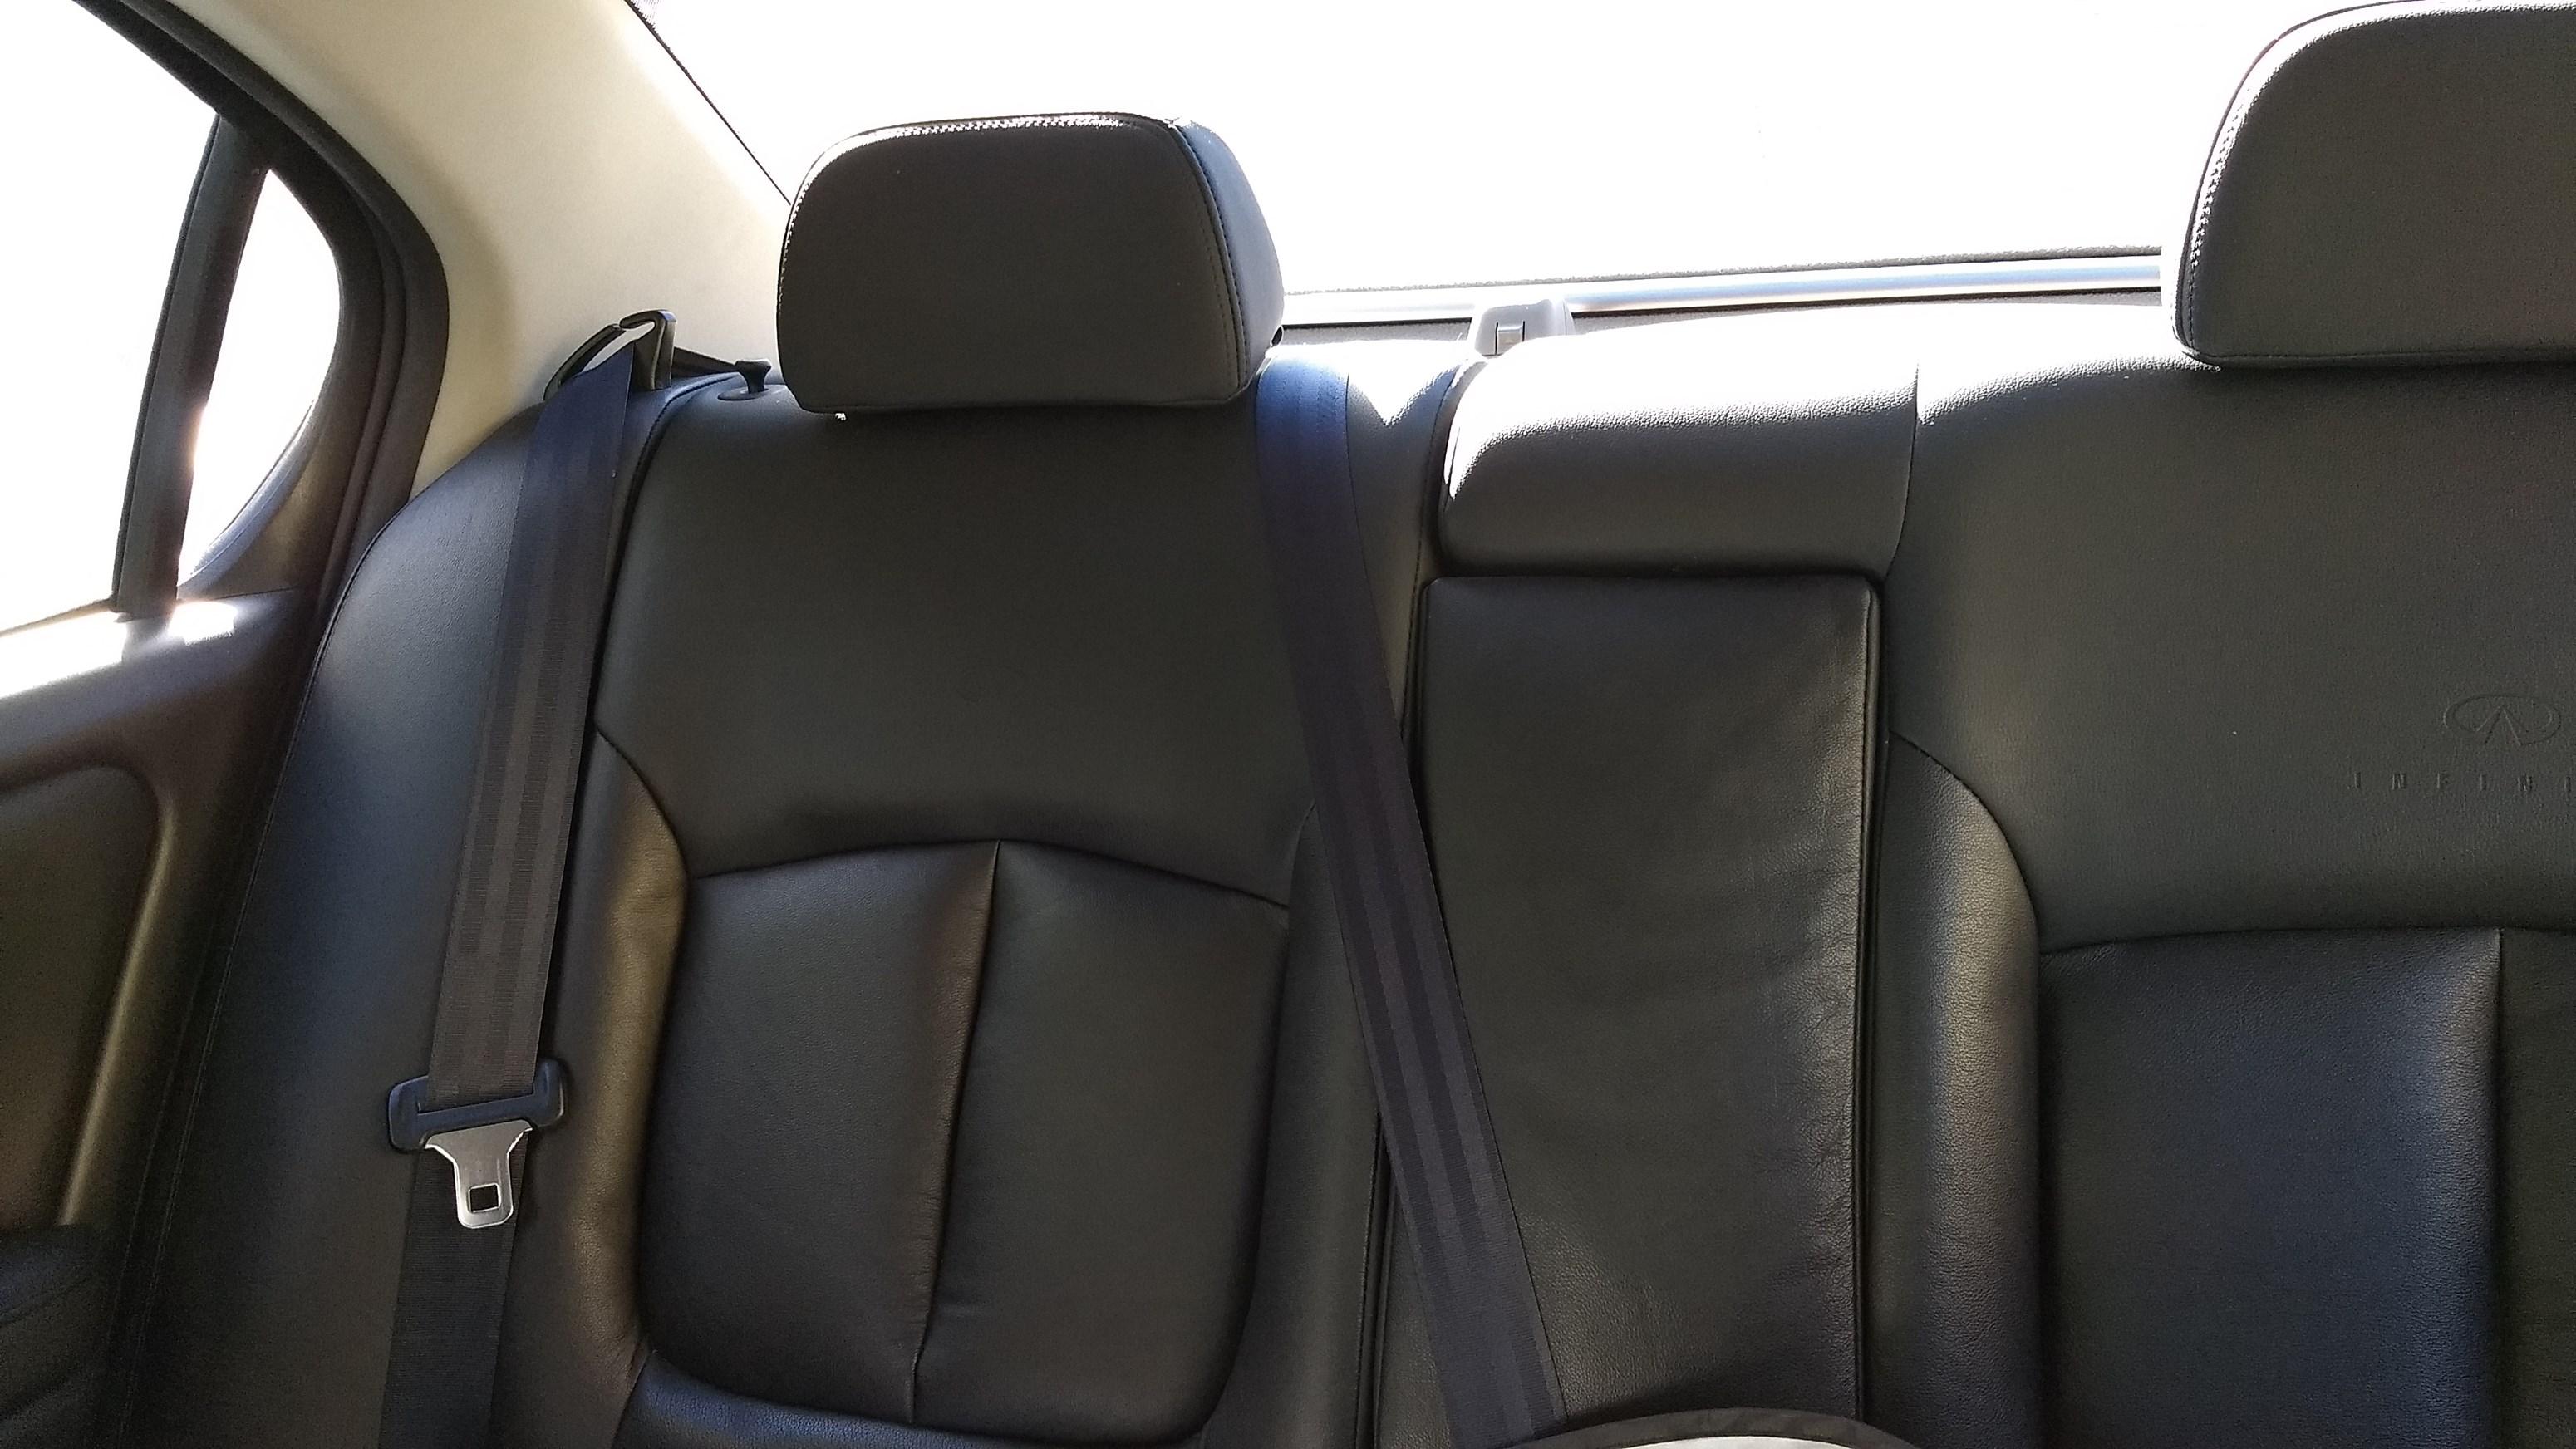 used usautomobile package irving premium dealers sedan tx infinity journey nj infiniti with